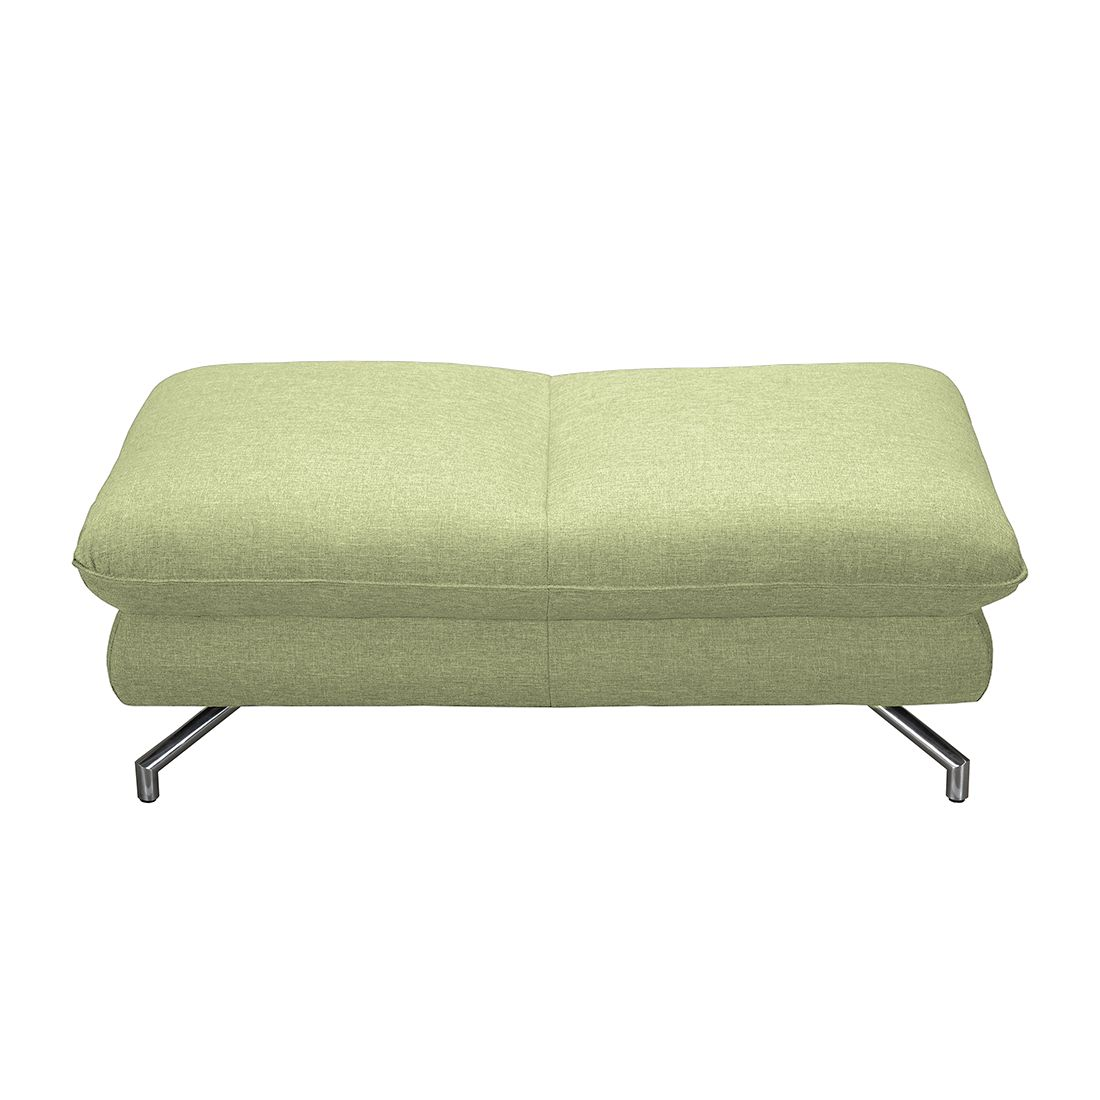 Hocker Sharon – Webstoff Grün, loftscape jetzt bestellen